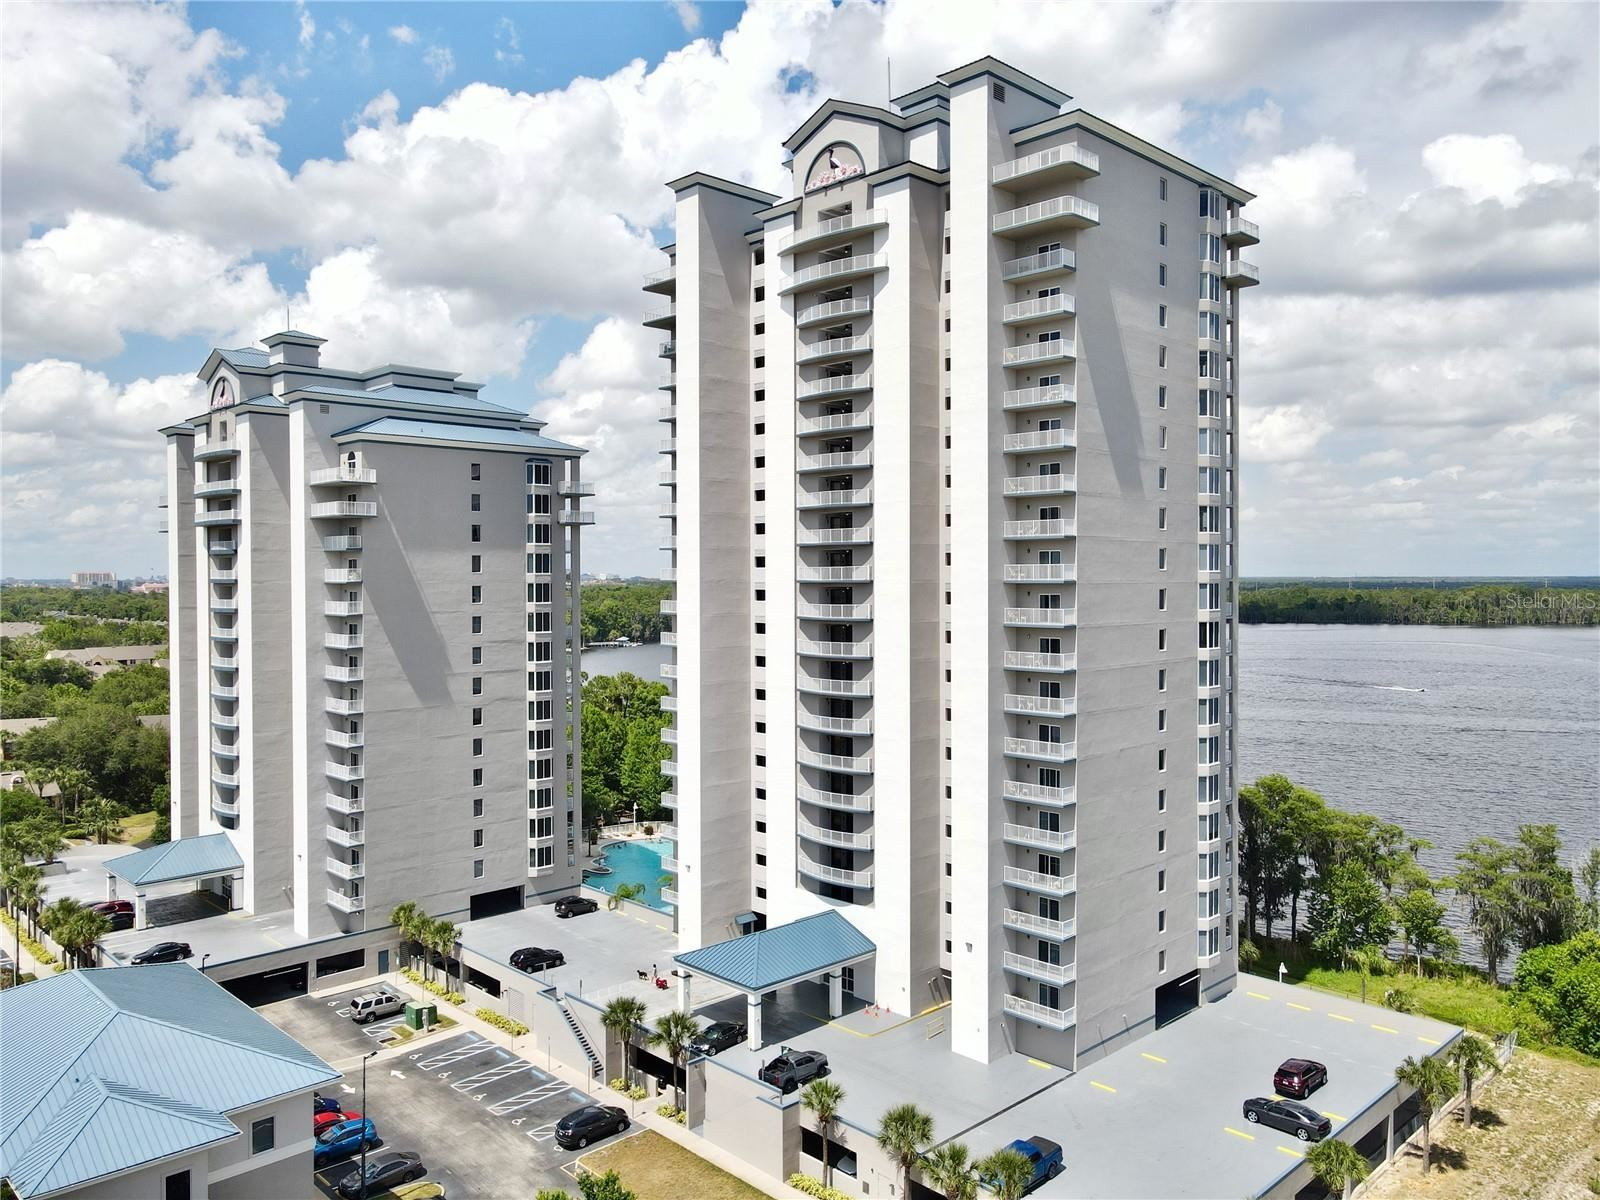 13427 BLUE HERON BEACH DRIVE #404, Orlando, FL 32821 - #: O5959771